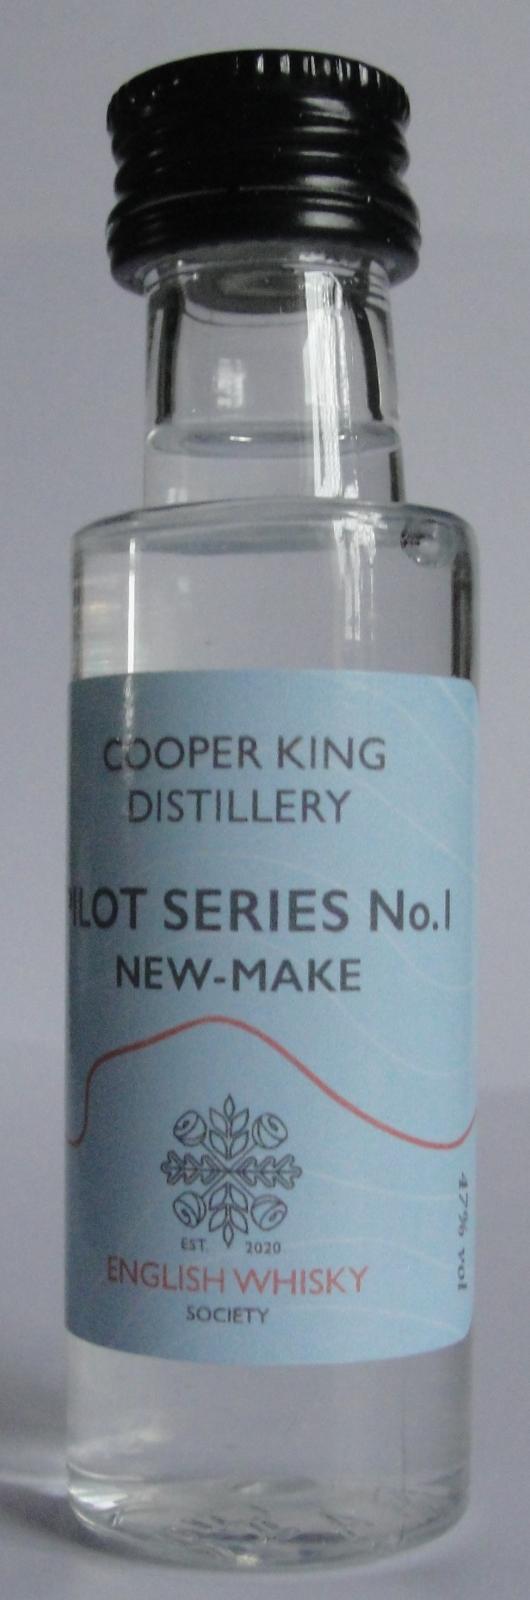 Cooper King Pilot Series No.1 TDT